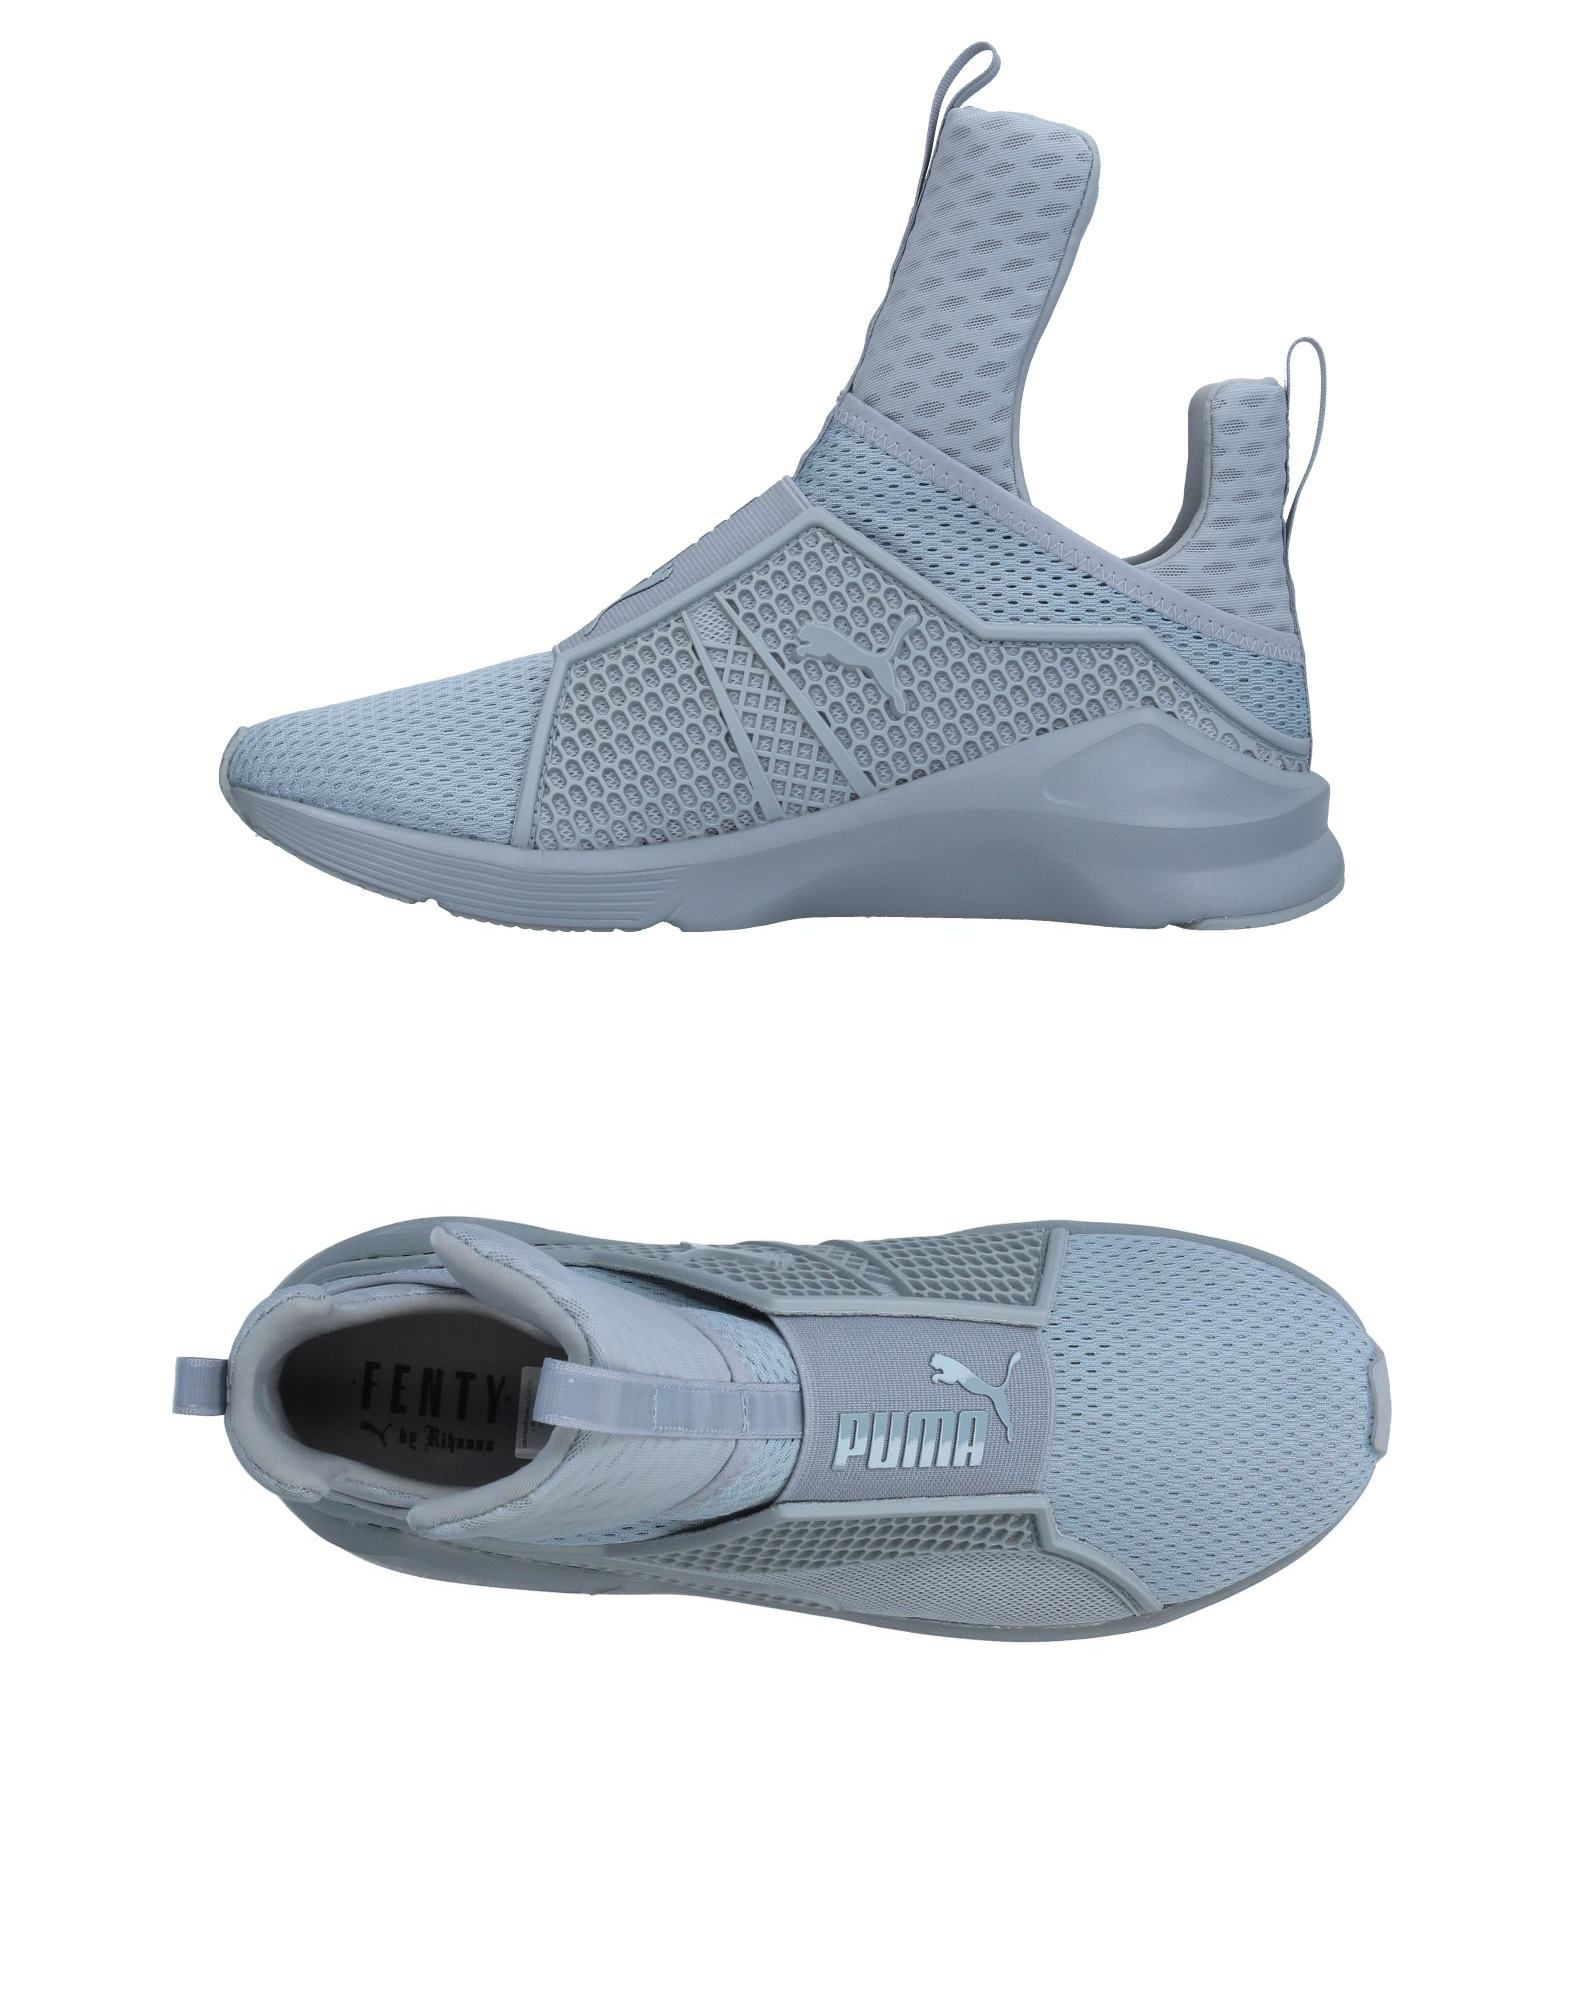 Rabatt echte Schuhe Fenty Puma By Rihanna Sneakers Herren  11305813OP